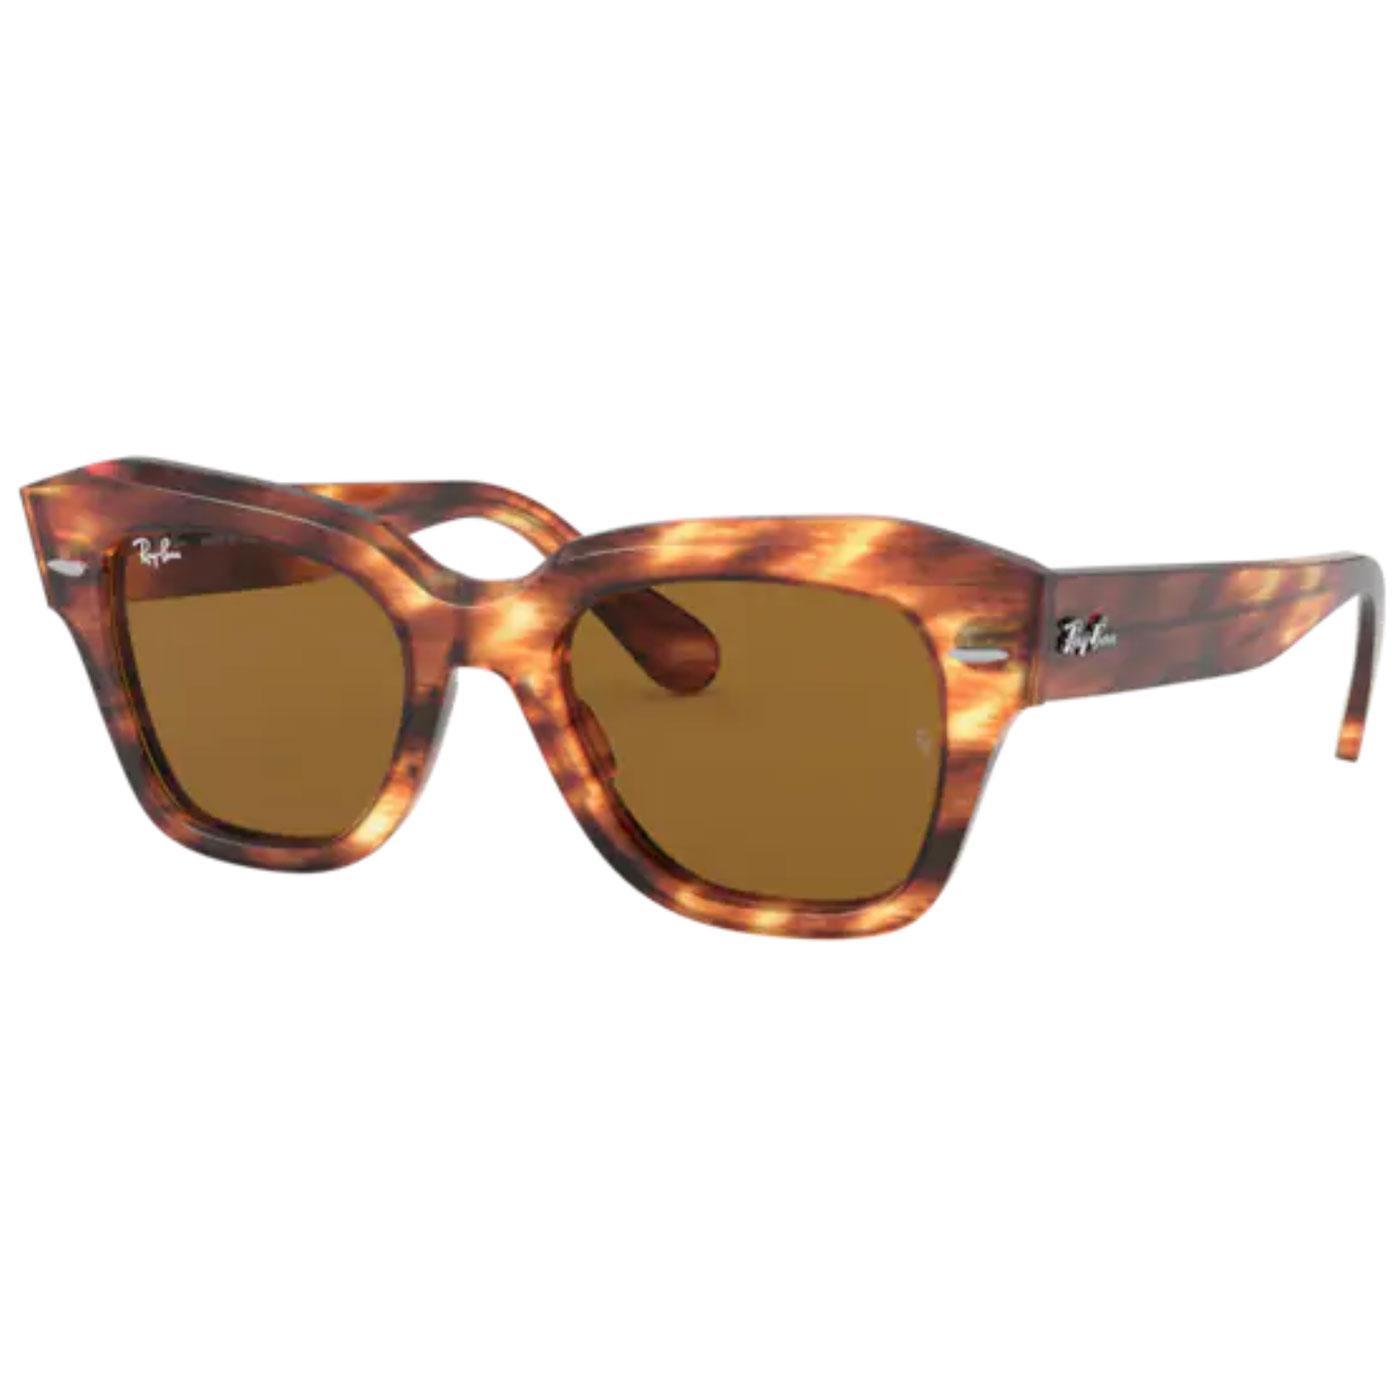 RAY-BAN RB2186 Cats Eye Wayfarer Sunglasses (LH)